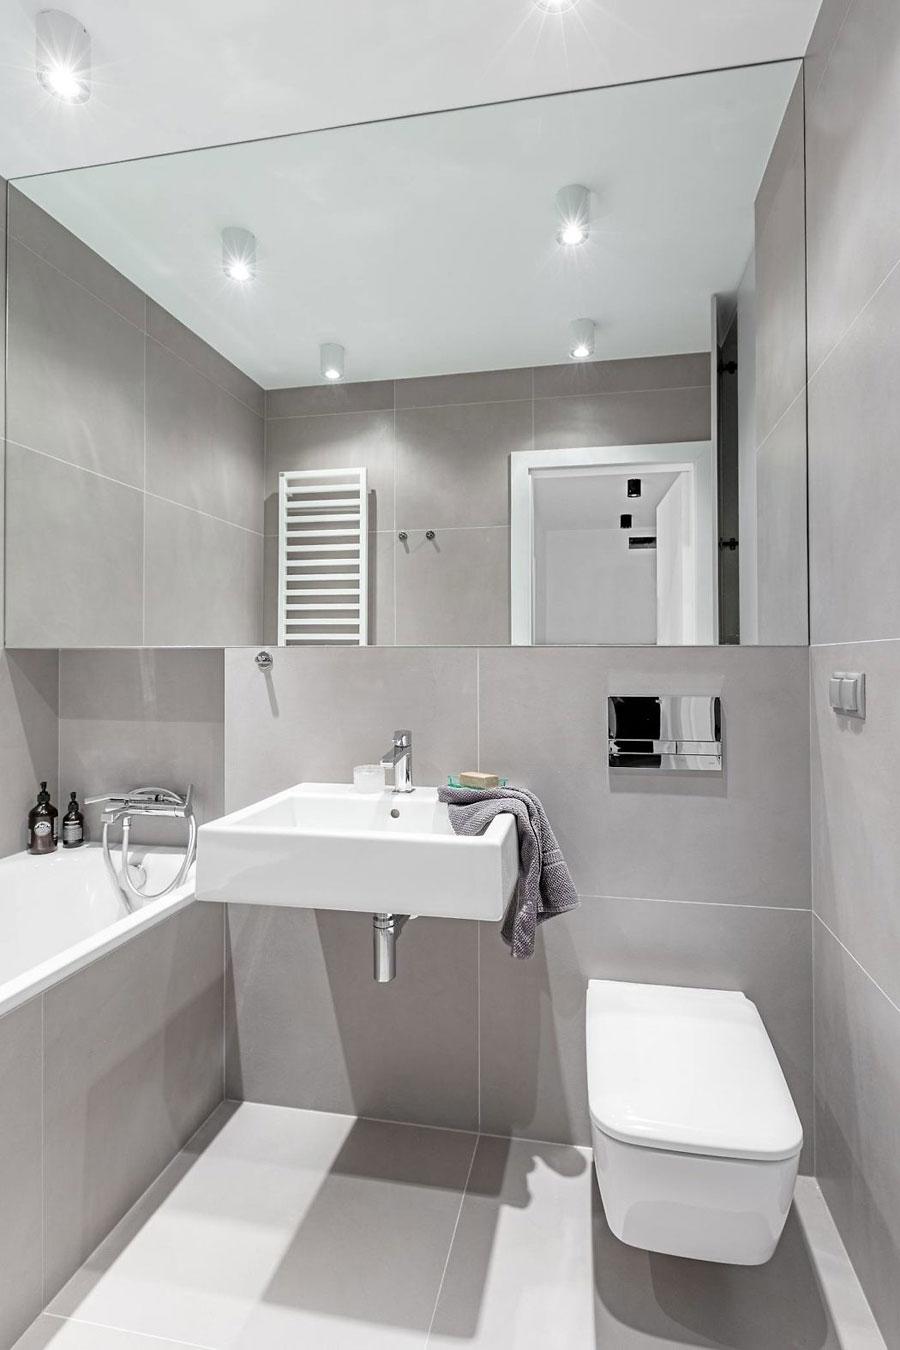 kleine moderne badkamer van 2 5m2 badkamers voorbeelden. Black Bedroom Furniture Sets. Home Design Ideas